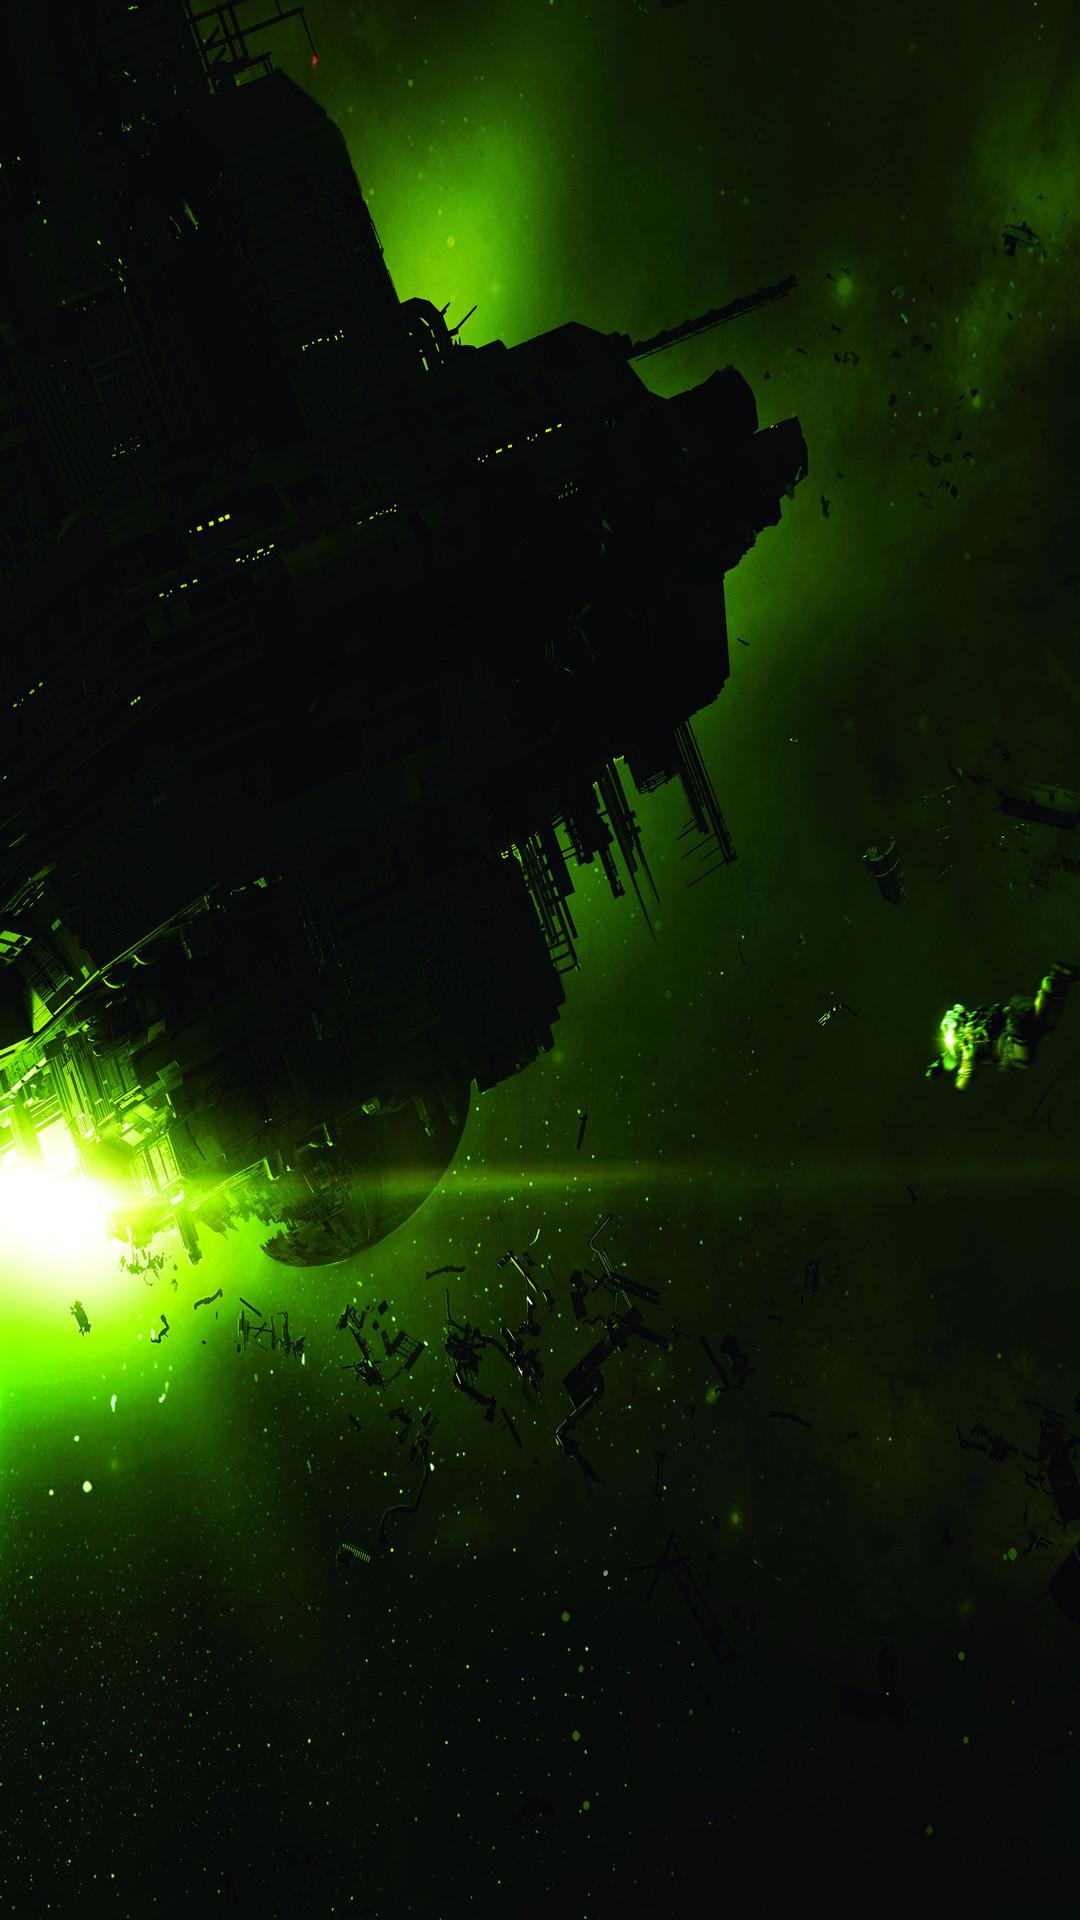 Alien: Isolation Wallpaper for Large Screen Smartphones : alienisolation